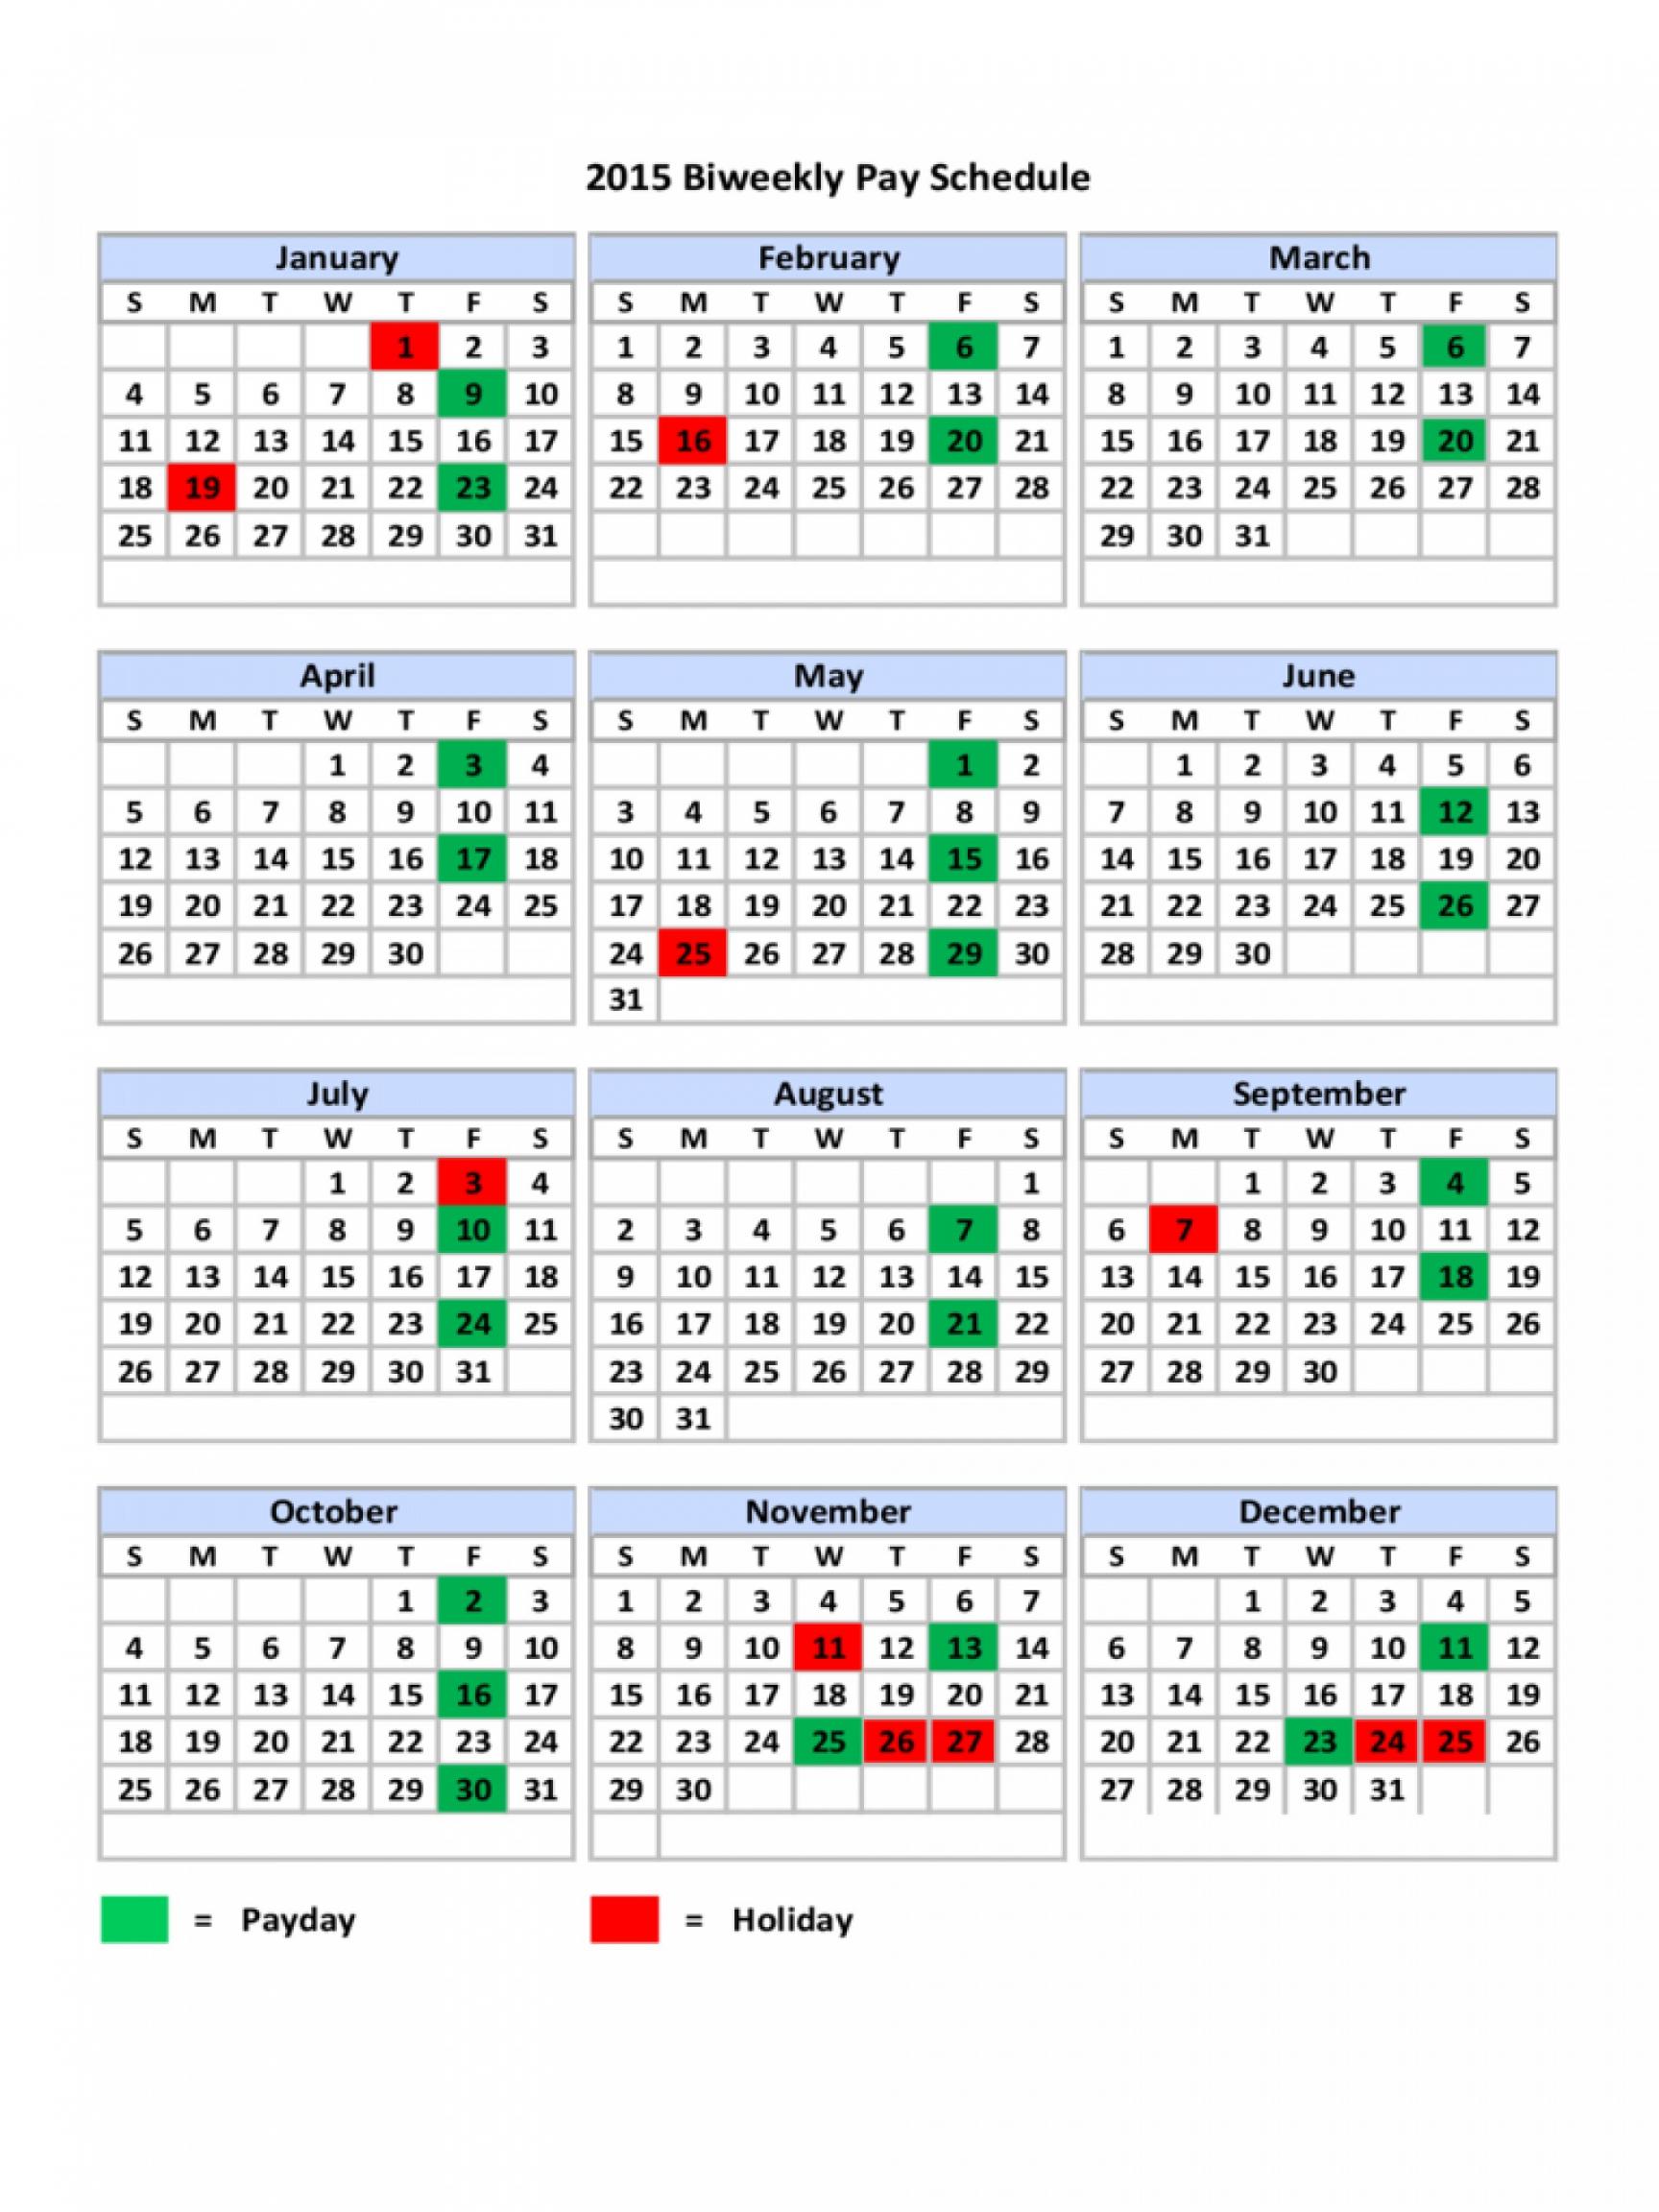 Biweekly Pay Schedule Template in Biweekly Payroll Schedule Template